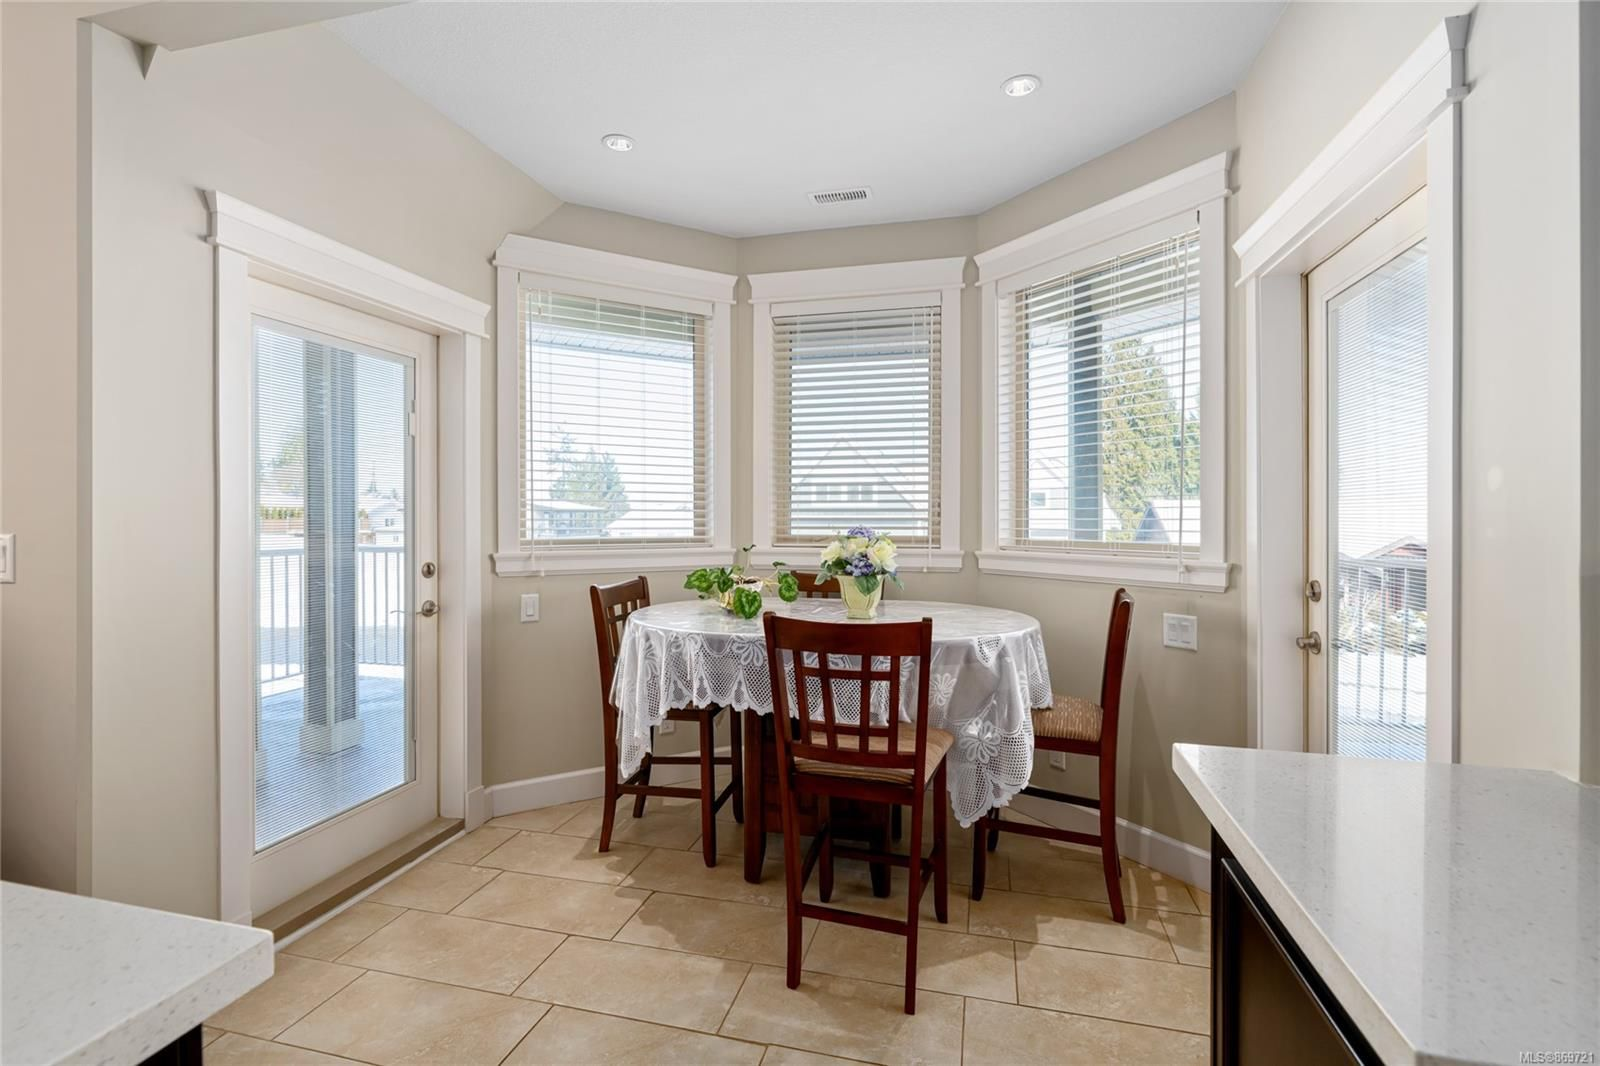 Photo 11: Photos: 2259 Leighton Rd in : Na South Jingle Pot House for sale (Nanaimo)  : MLS®# 869721